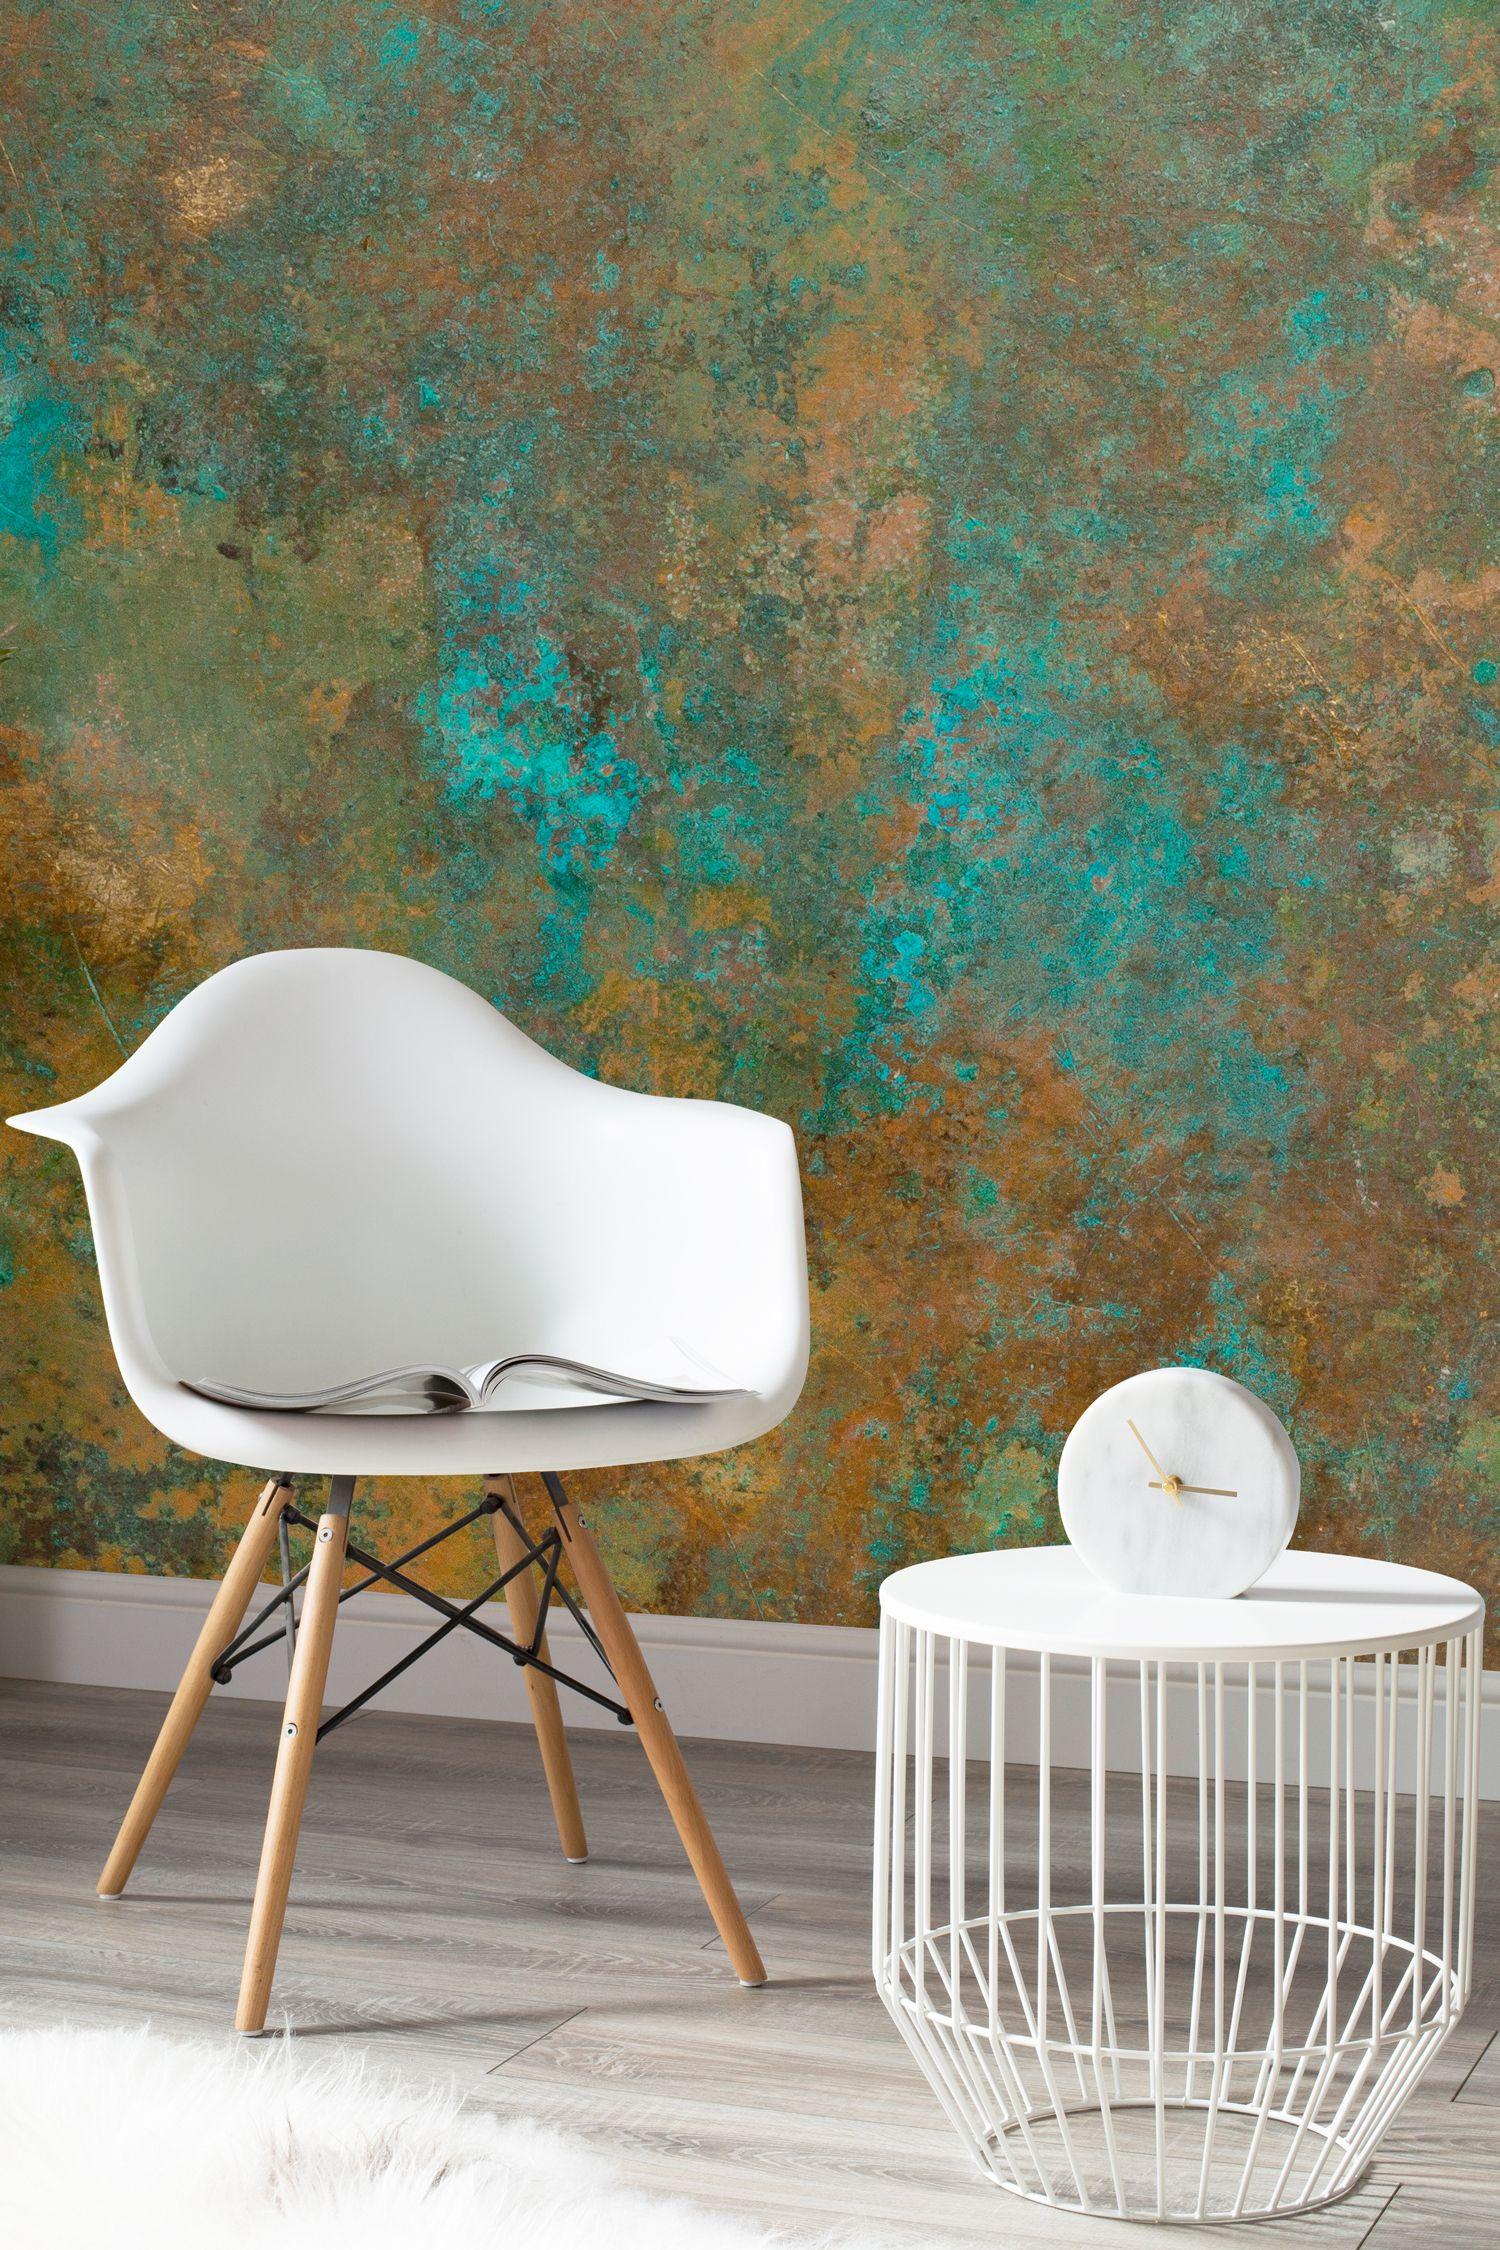 Copper Verdigris Wallpaper Mural | Patina Effect ...